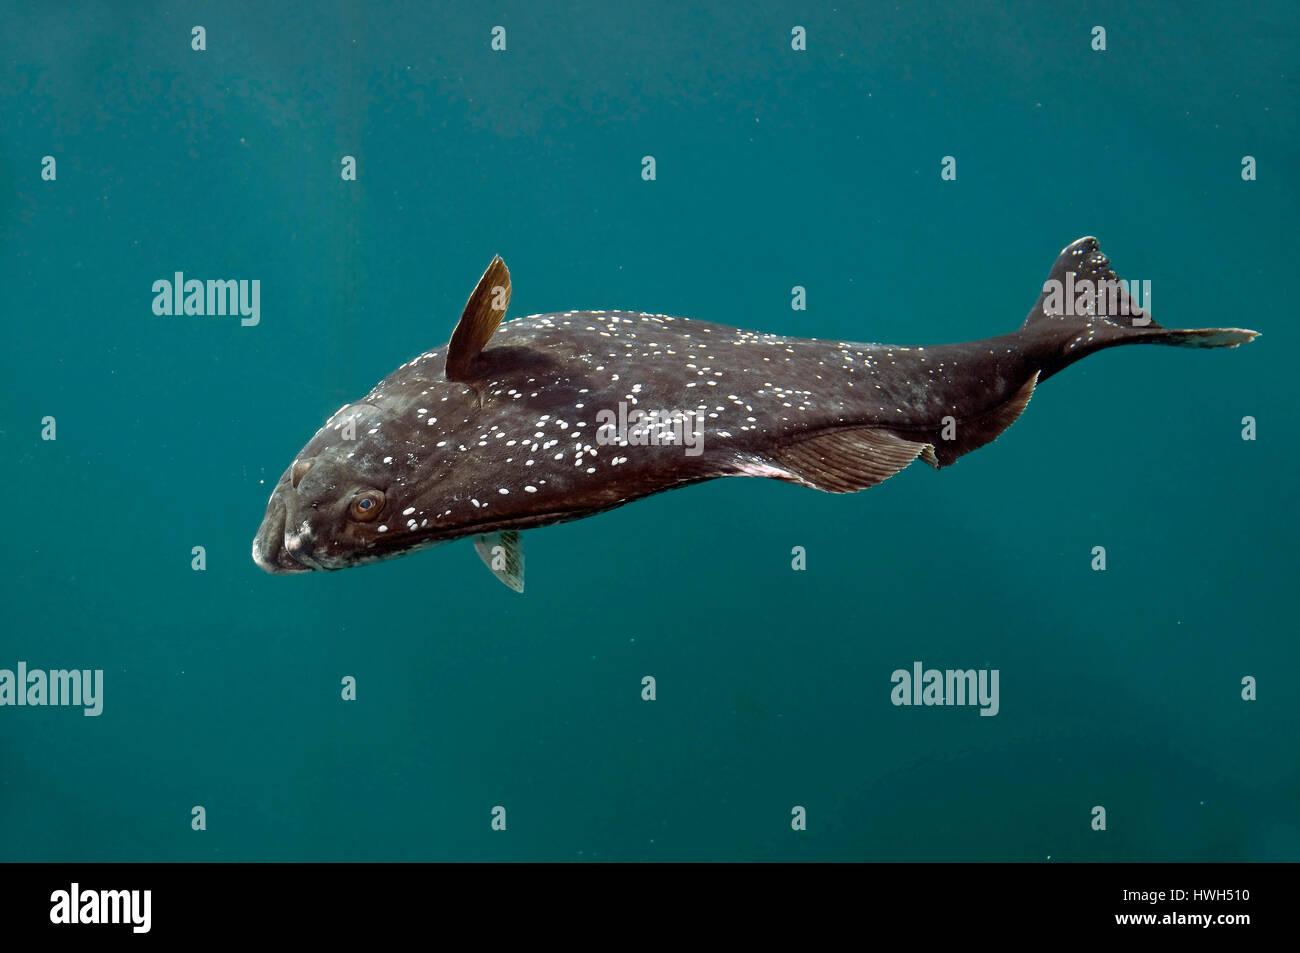 A 200 kg heavy Halibut (Hippoglossus hippoglossus). The white spots are parasites (marine flukes, class Trematoda). - Stock Image